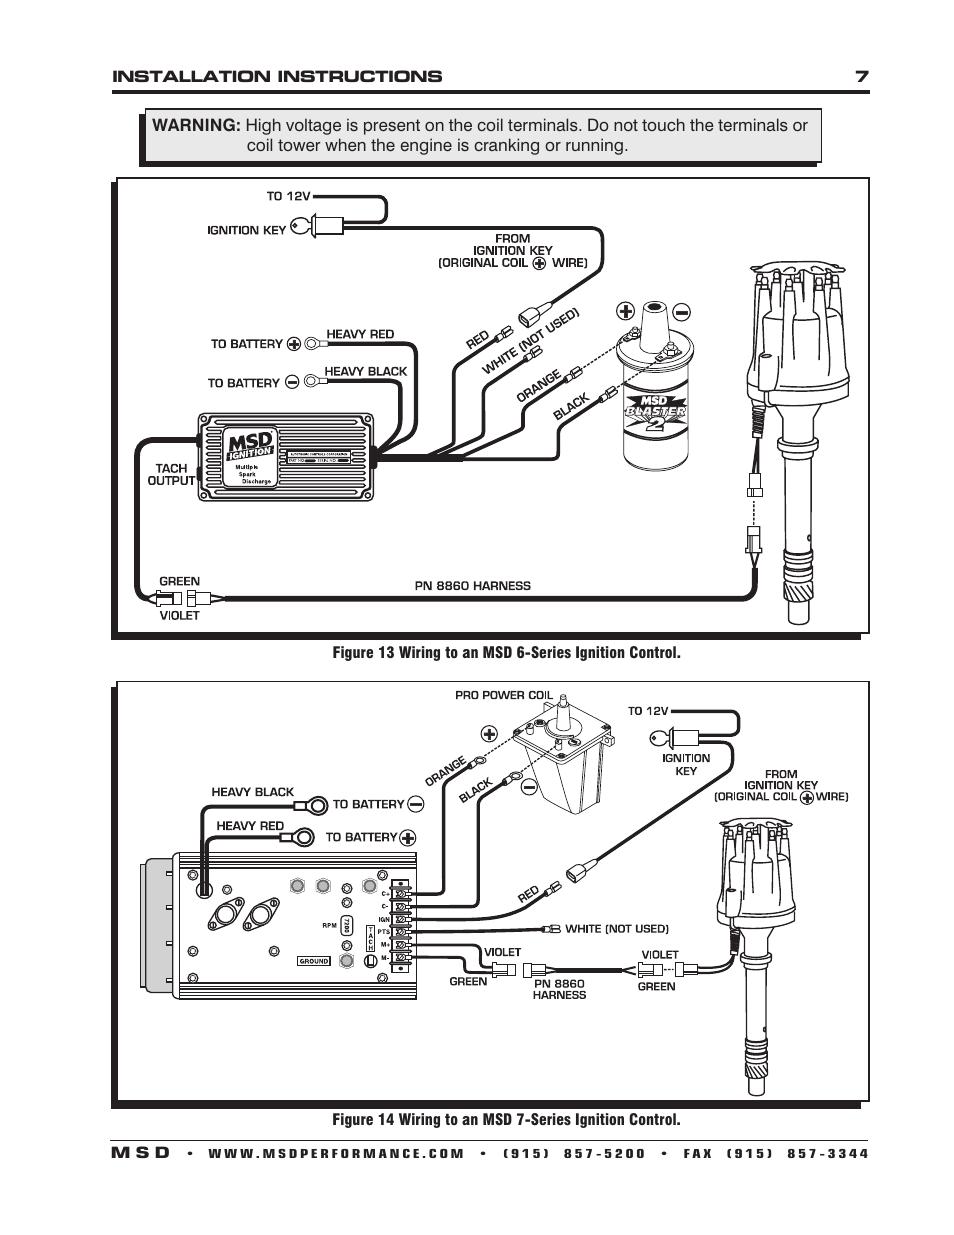 msd 85551 chevy v8 pro billet distributor installation page7?w=1000 msd pro billet ignition wiring diagram